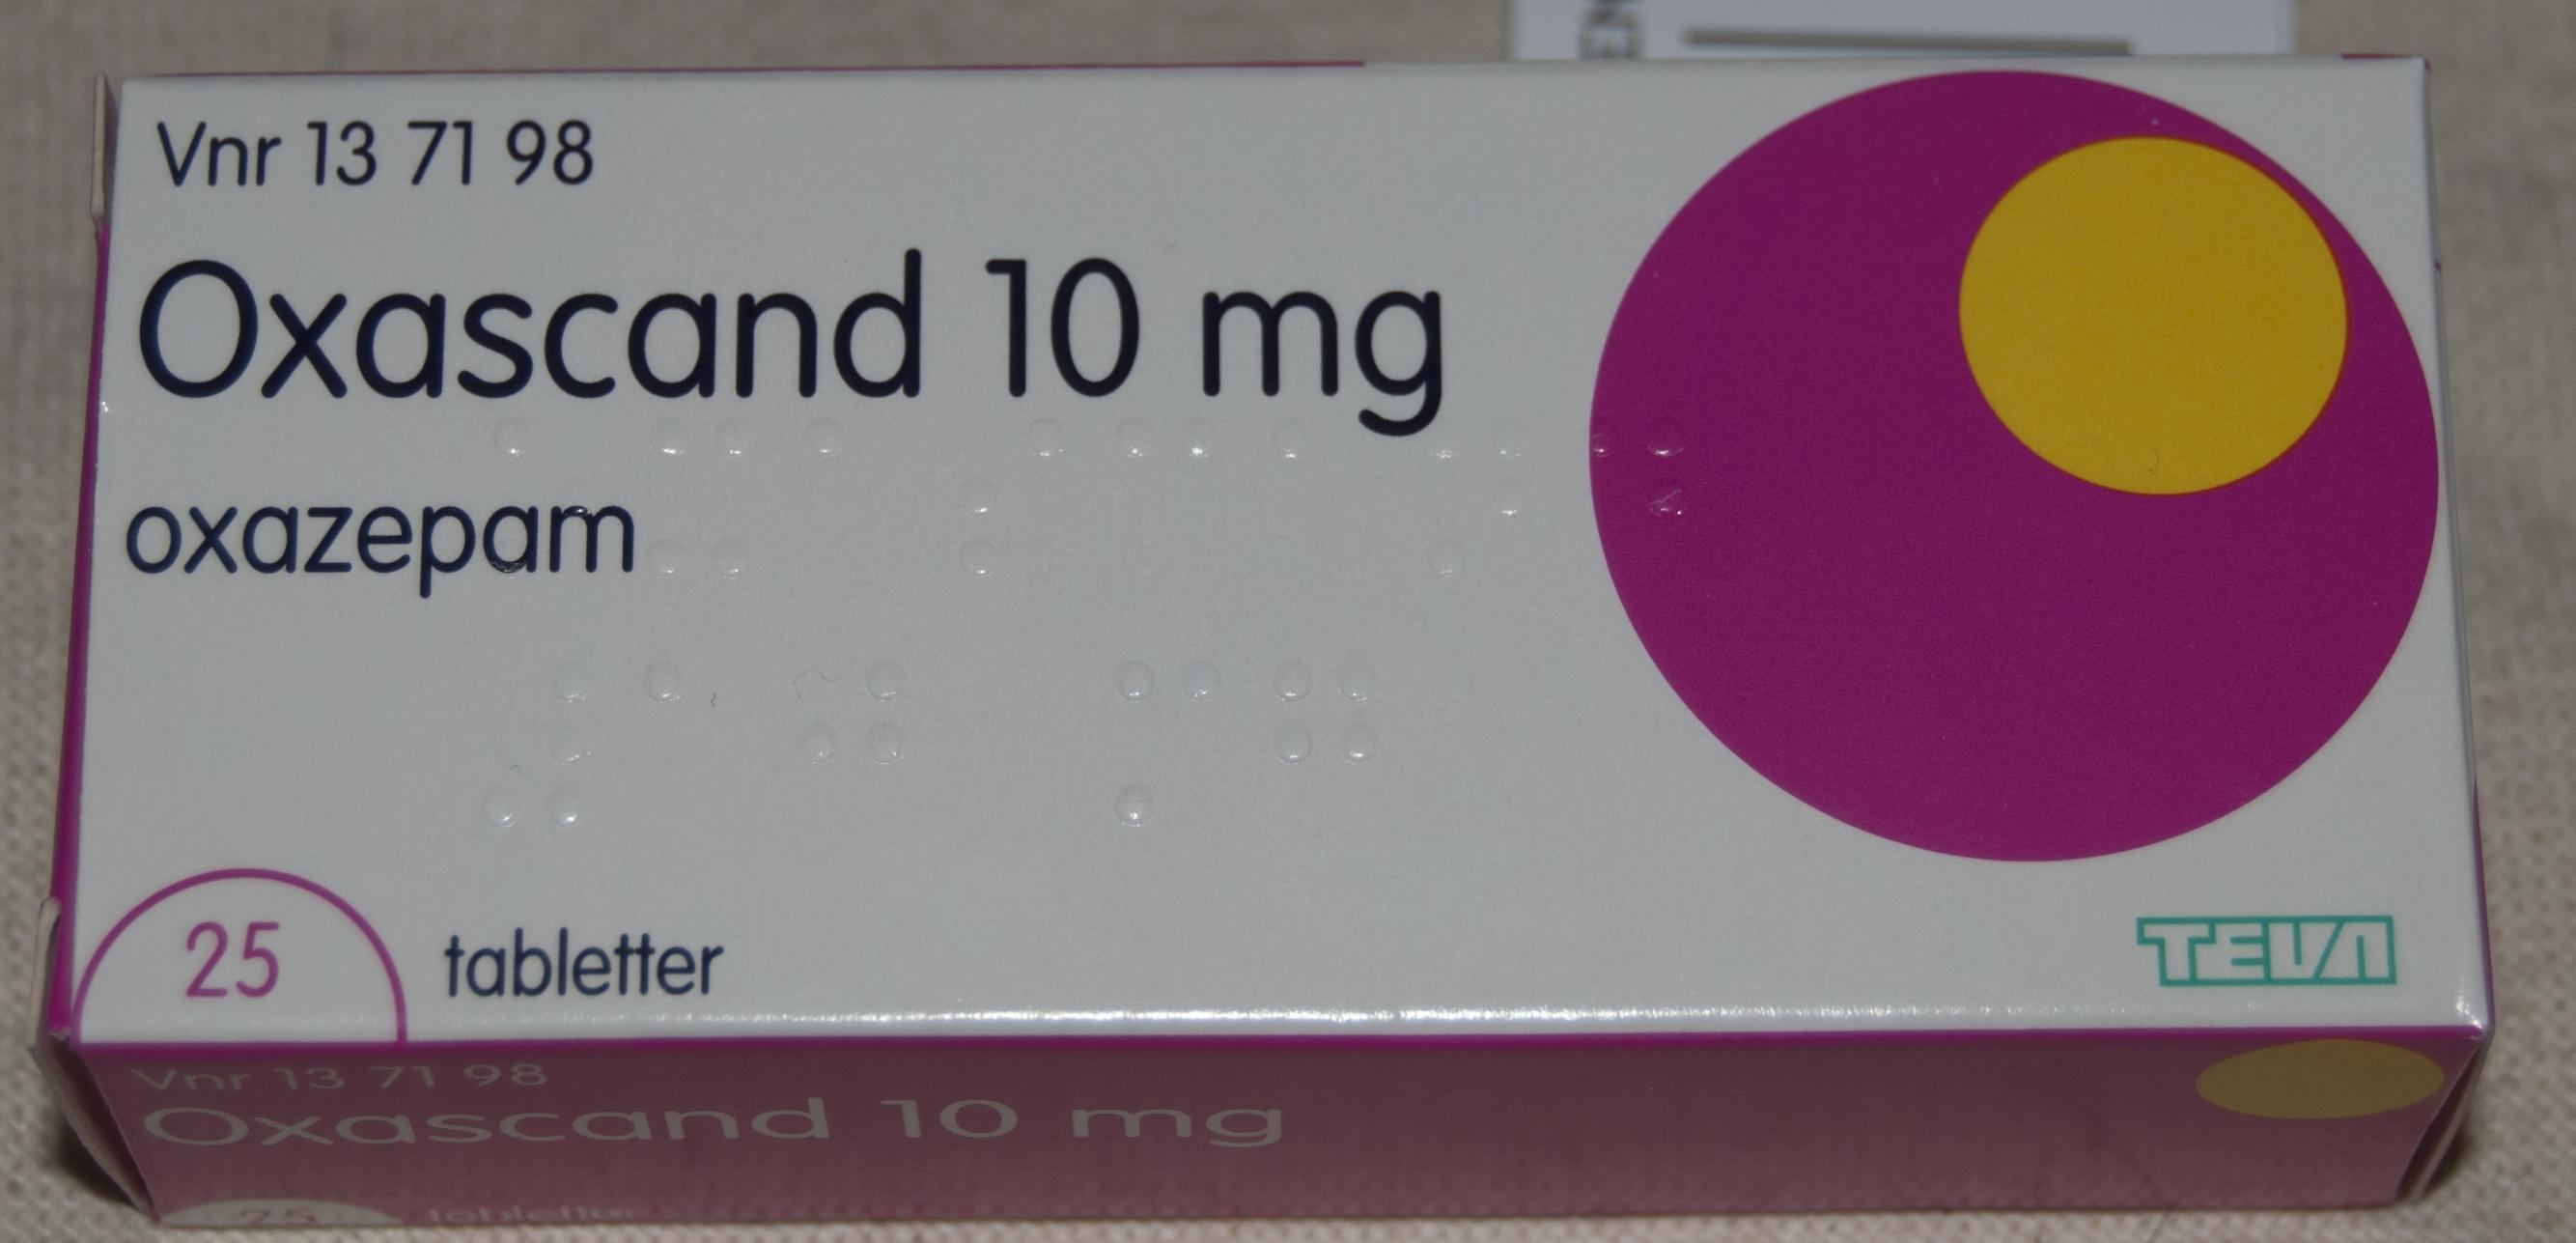 oxascand 10 mg